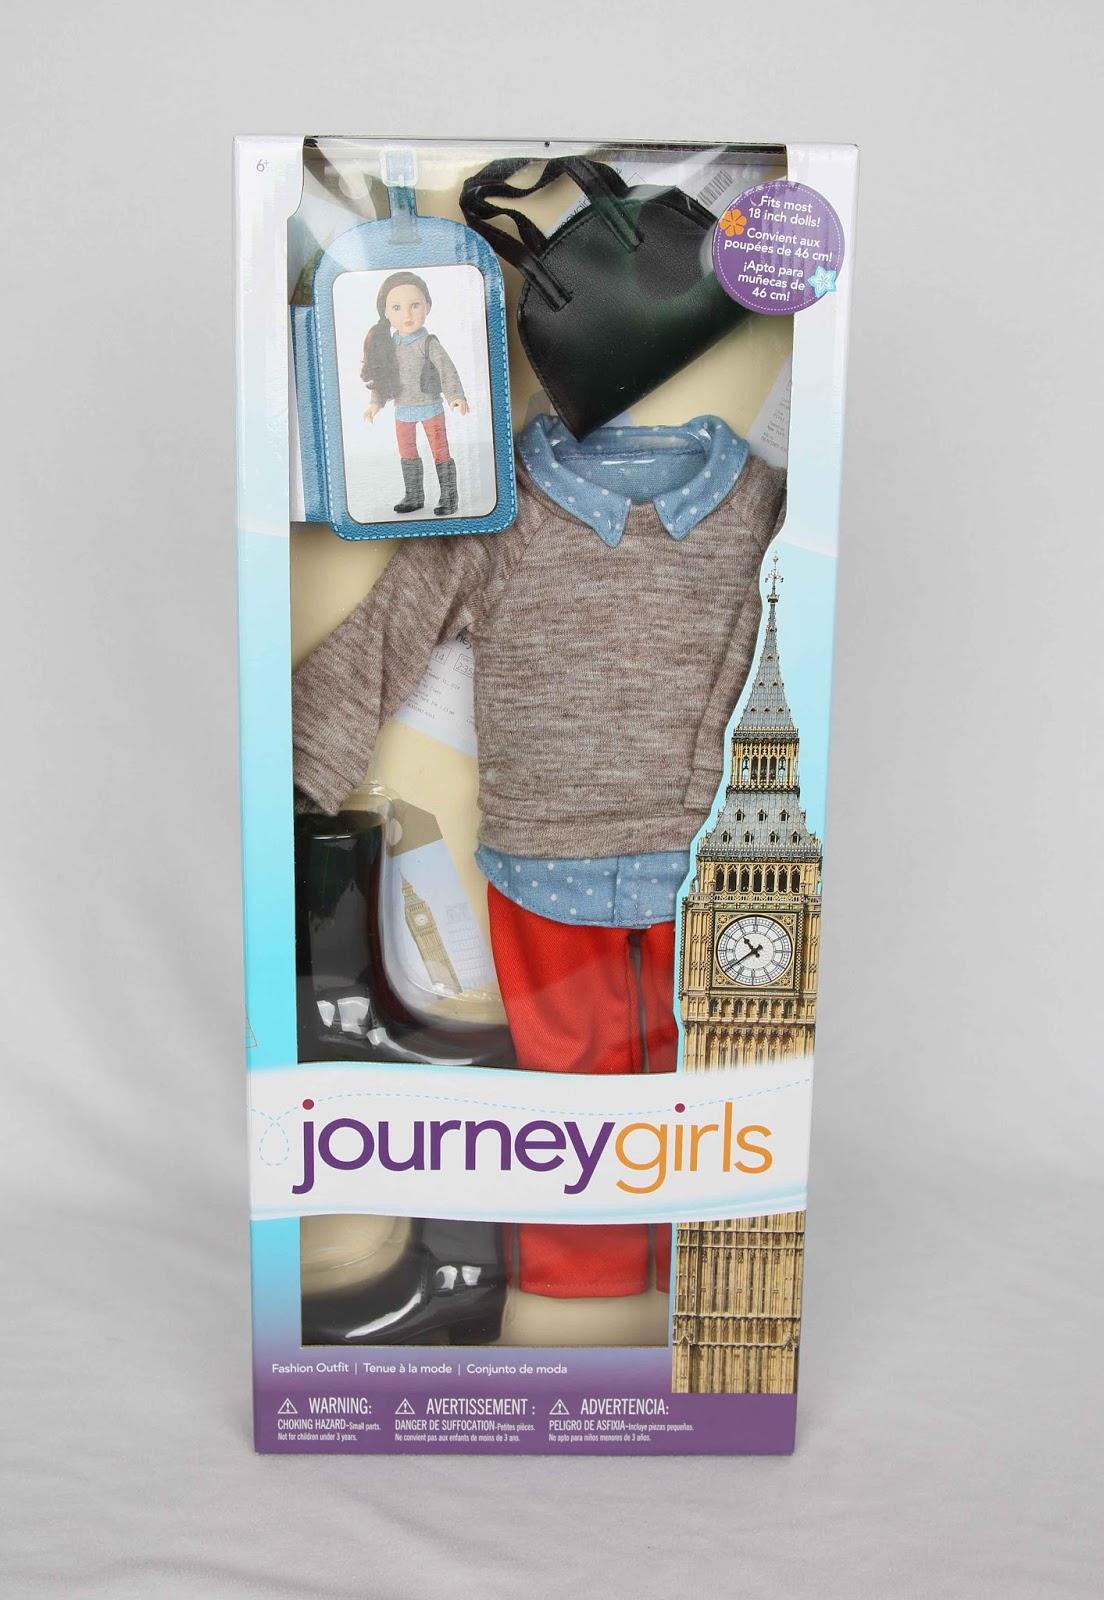 My Journey Girls Dolls Adventures: Another New Journey